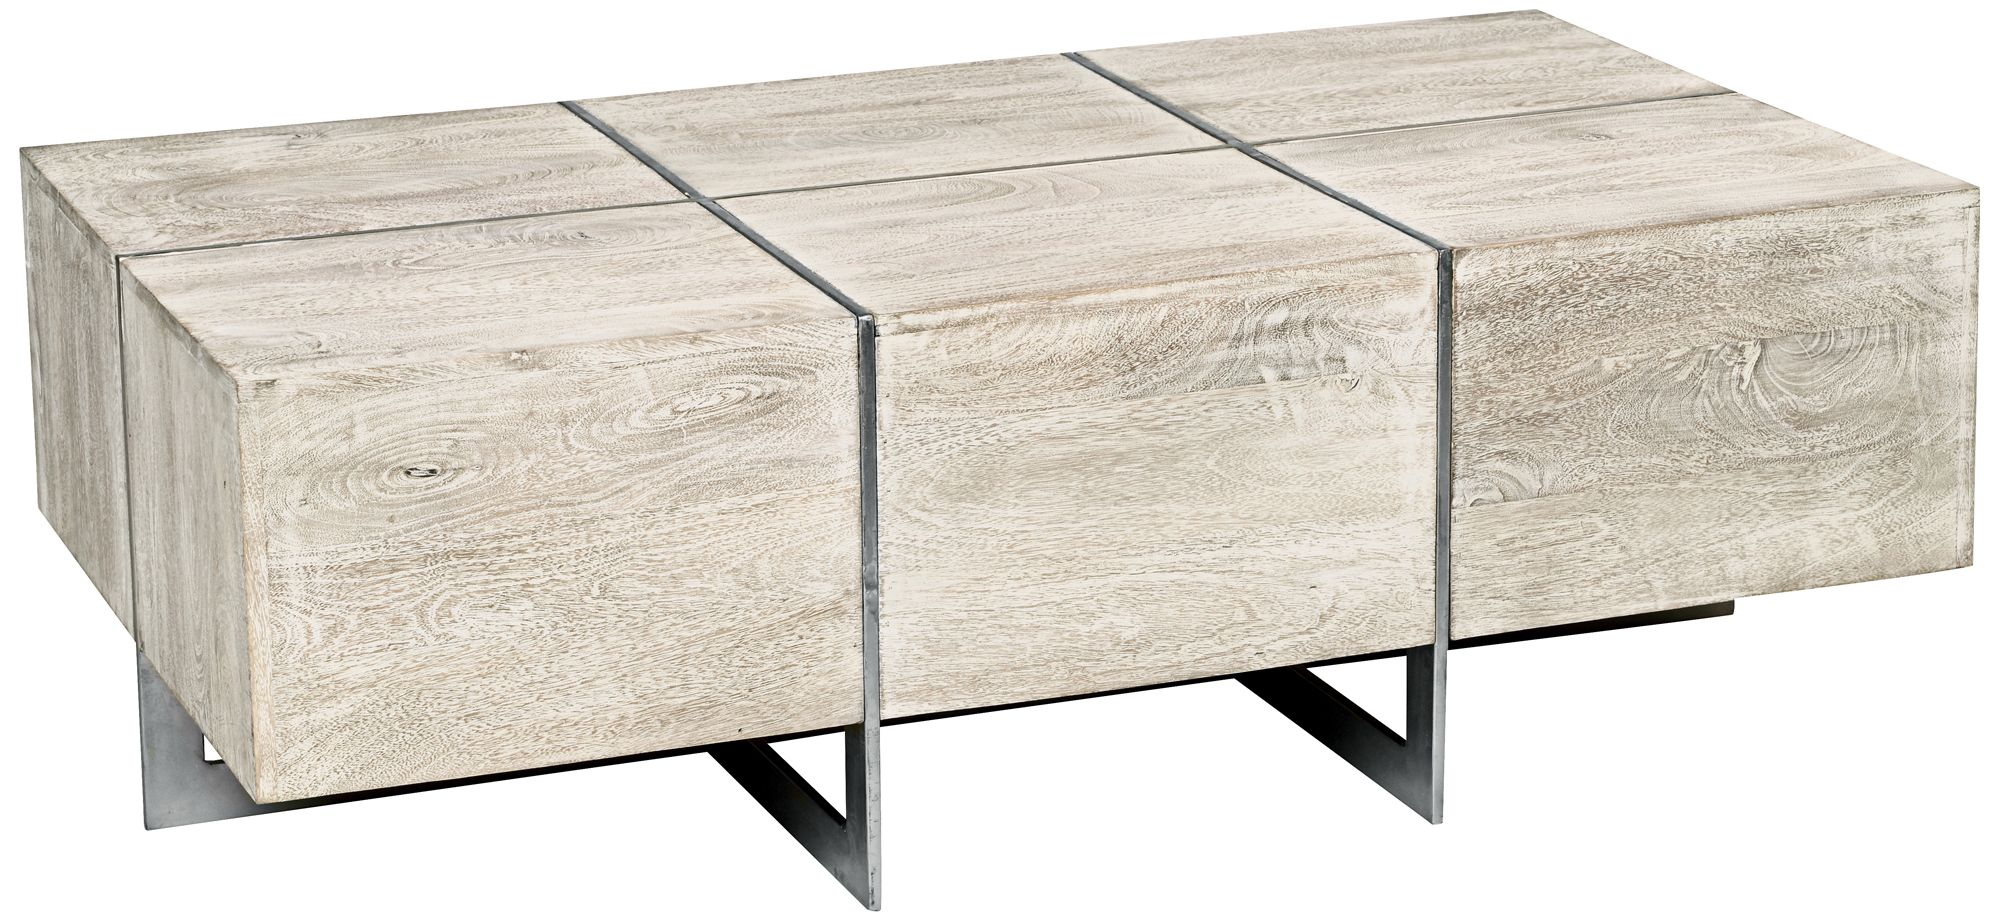 Desmond Whitewash Wood Matte Nickel Coffee Table